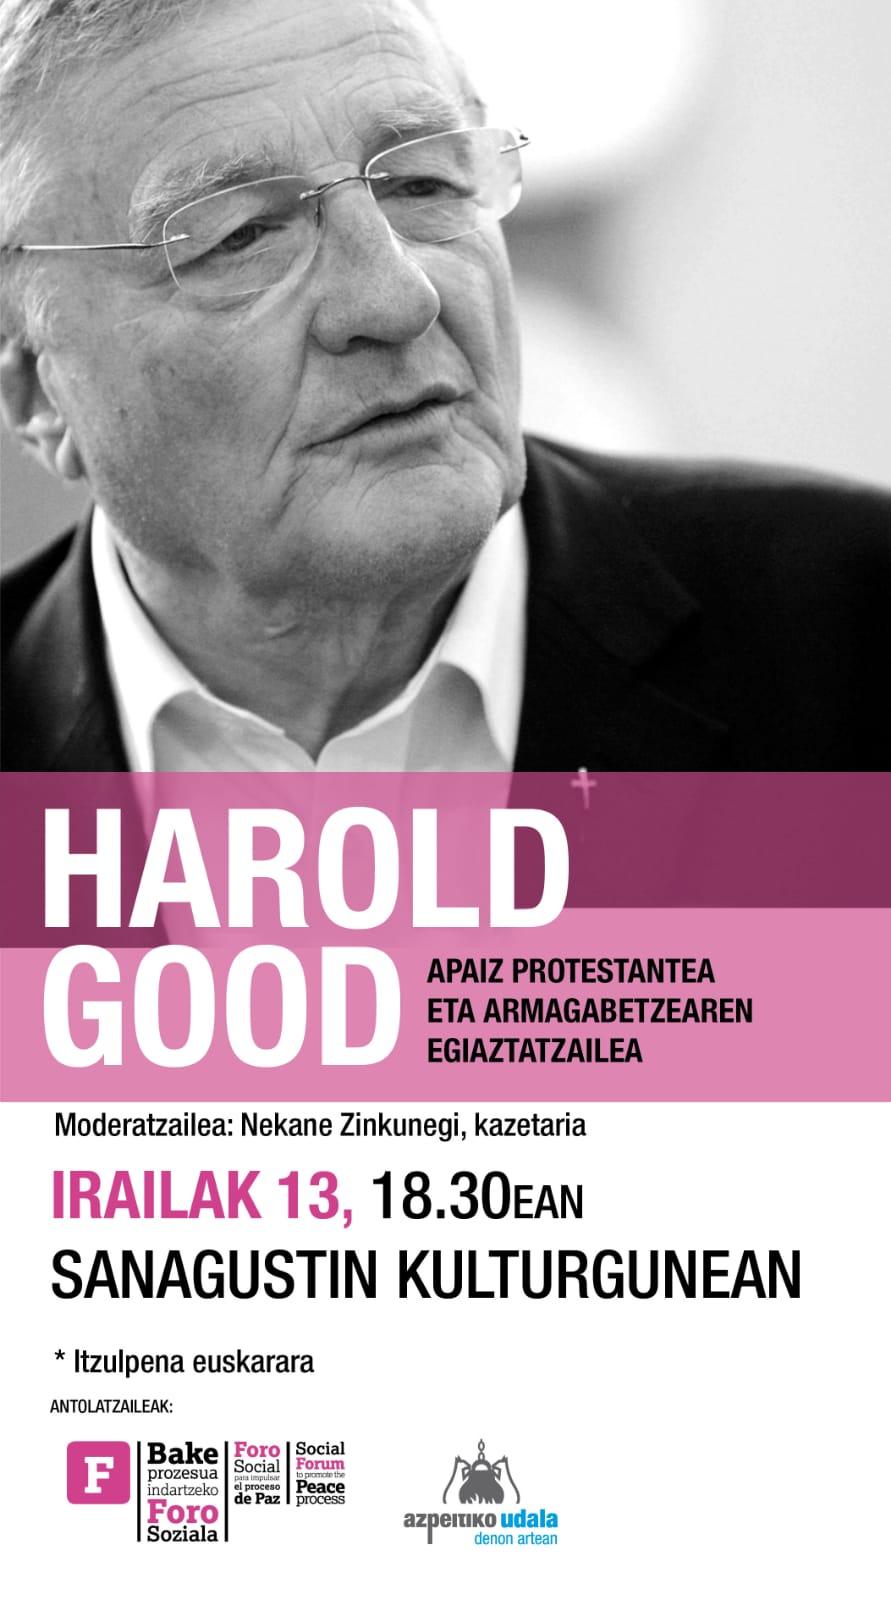 Harold Good